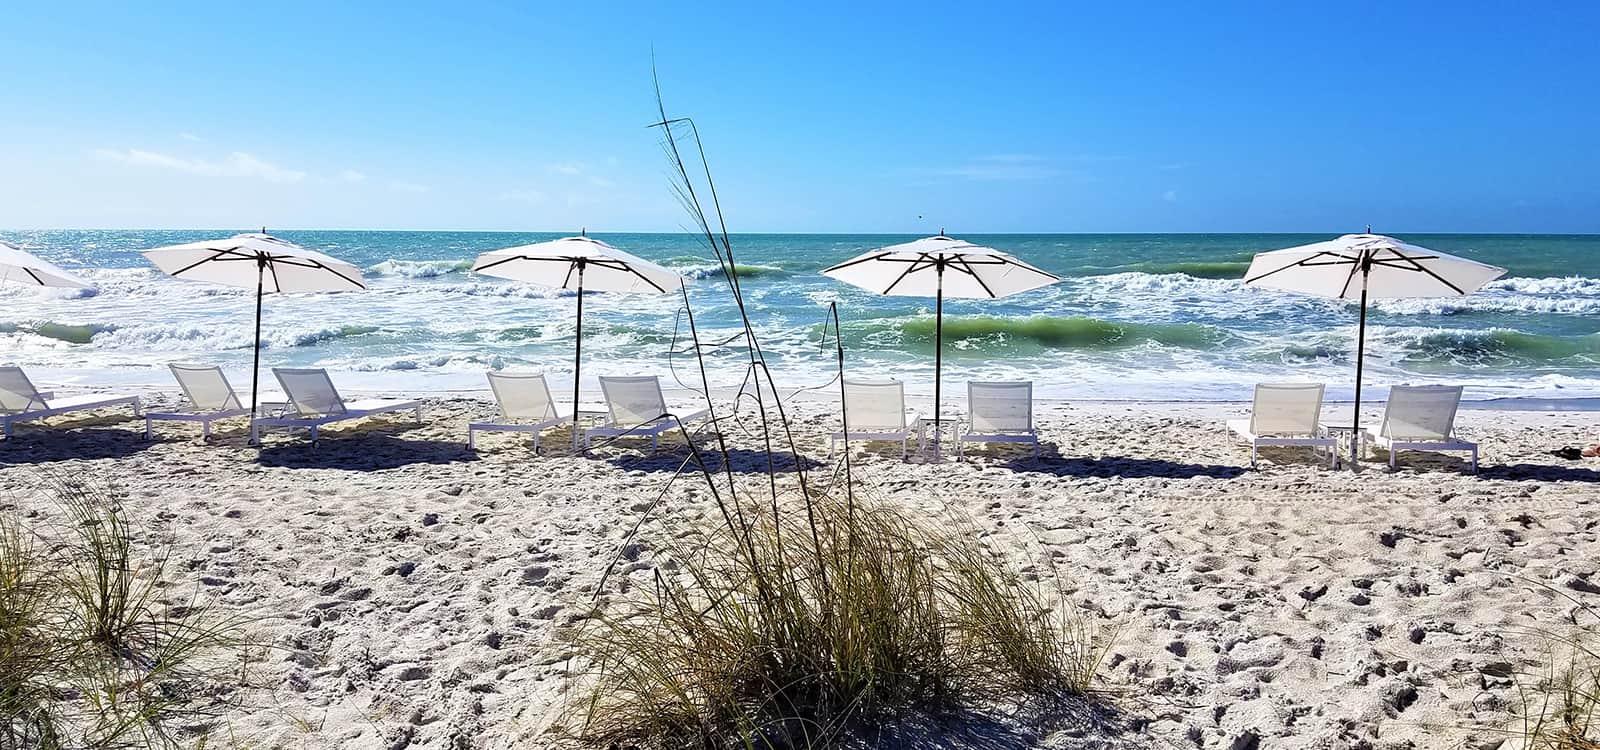 Where Is Bali Hai Island bali hai beachfront resort & spa | anna maria island hotel